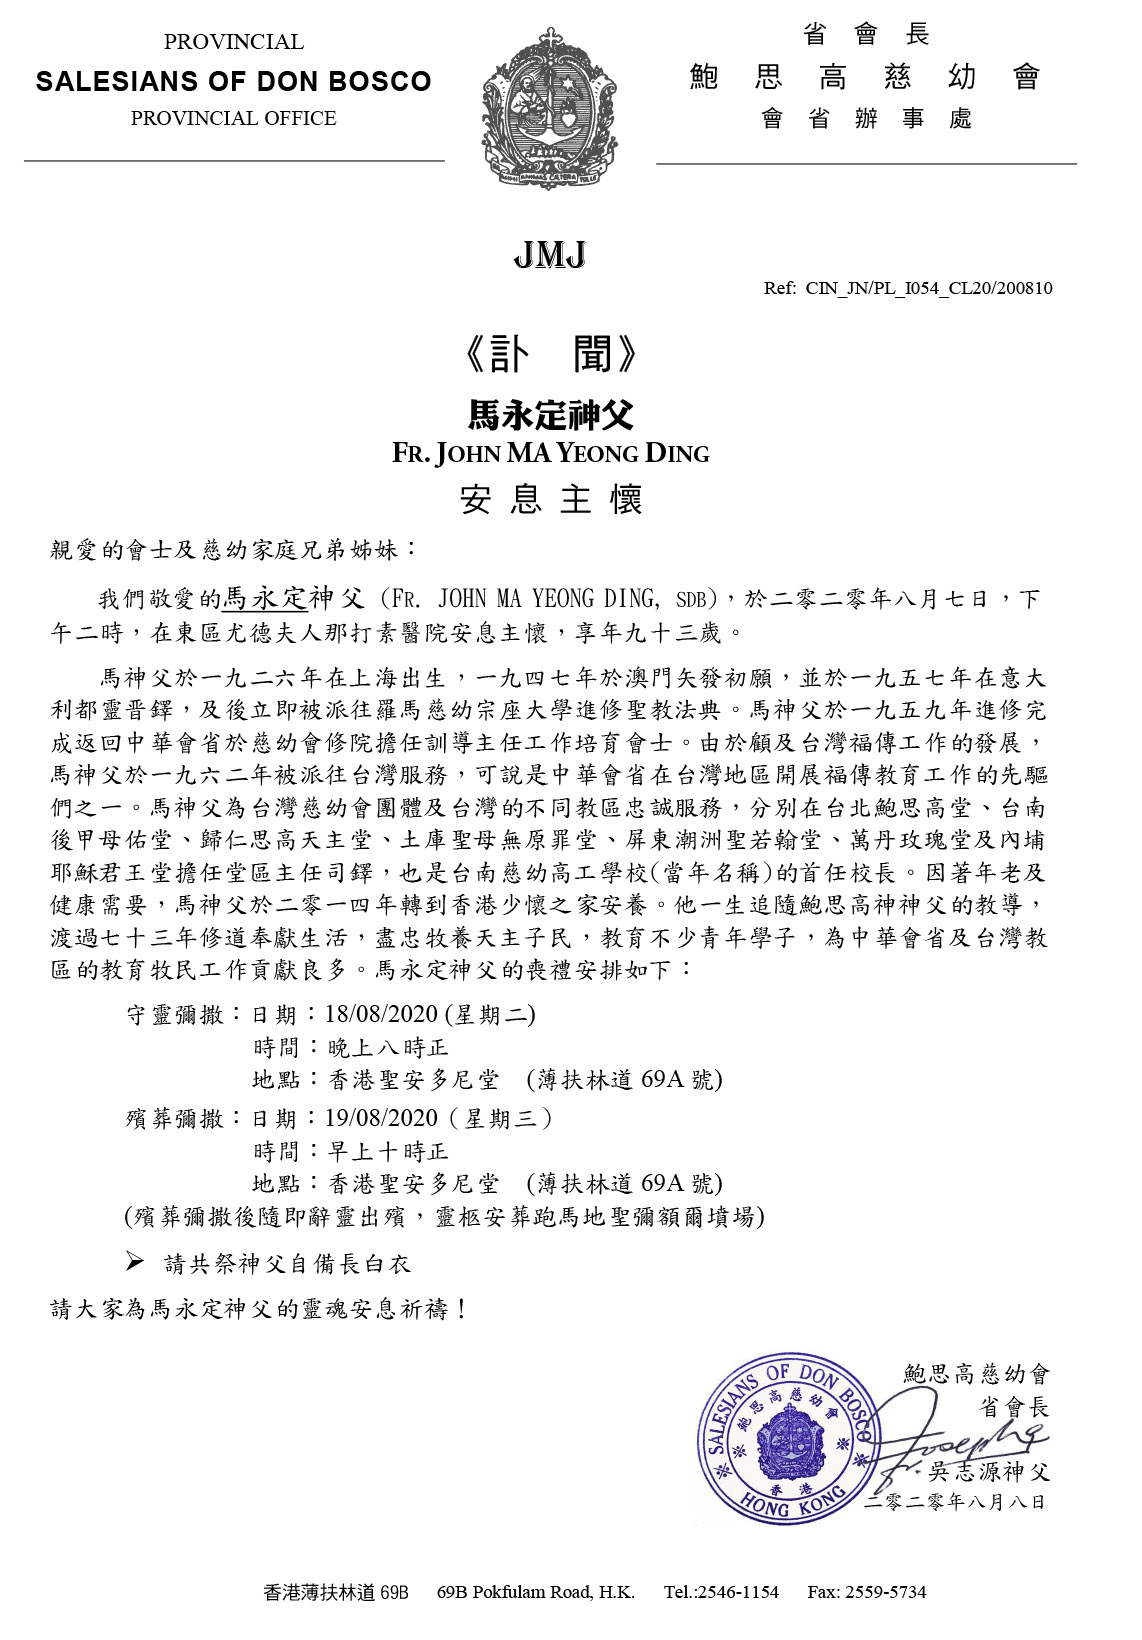 Microsoft Word - Obituary_會士版_馬永定神父_200809